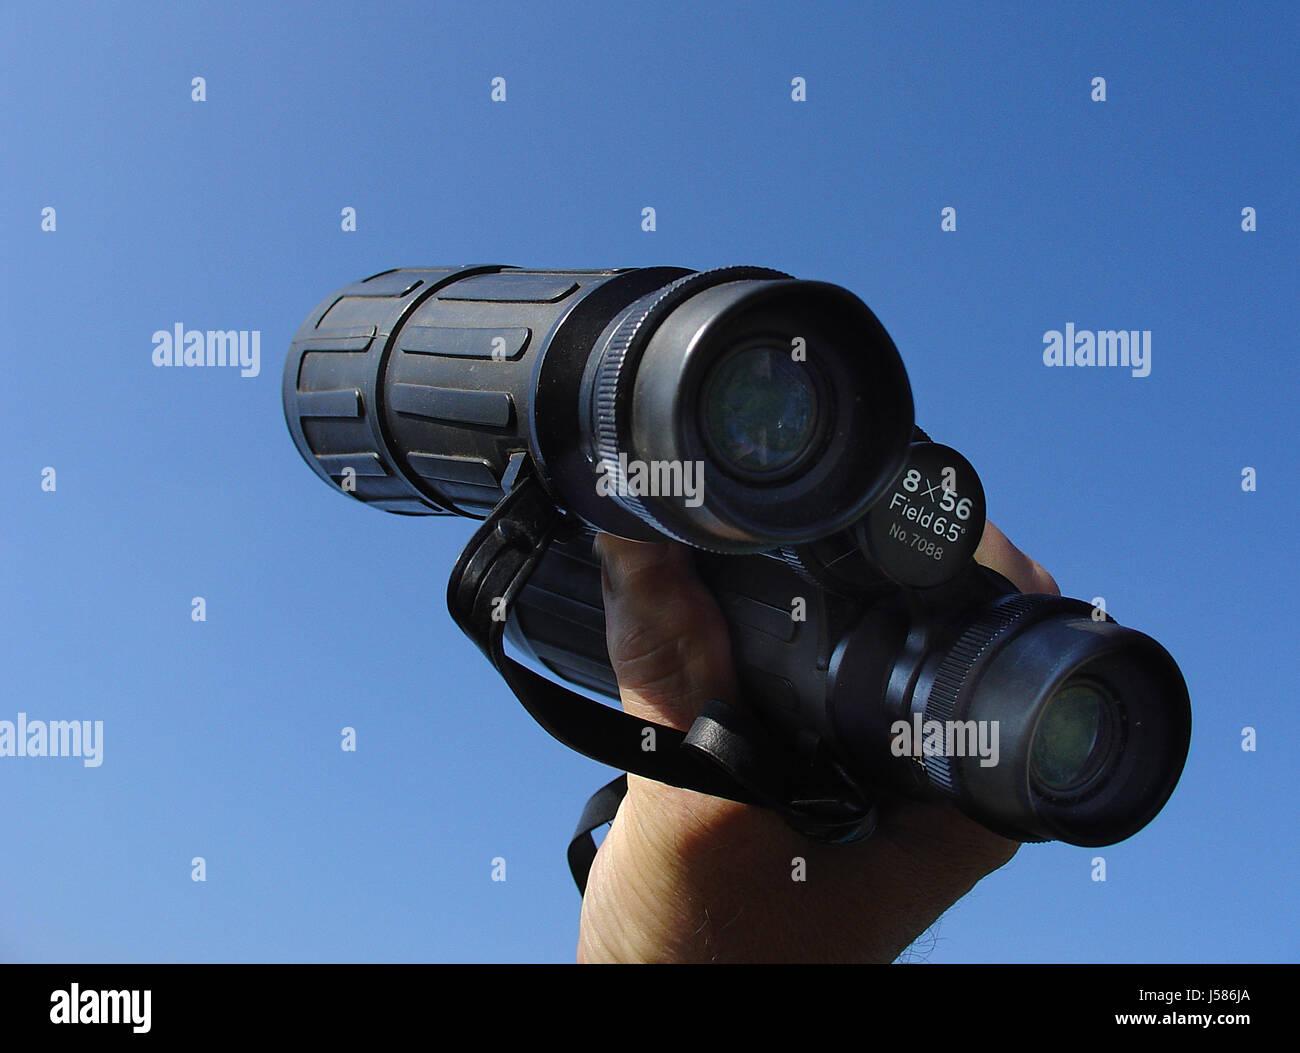 e70876f8 hand observation lens magnifier binoculars lenses enlargement field glasses